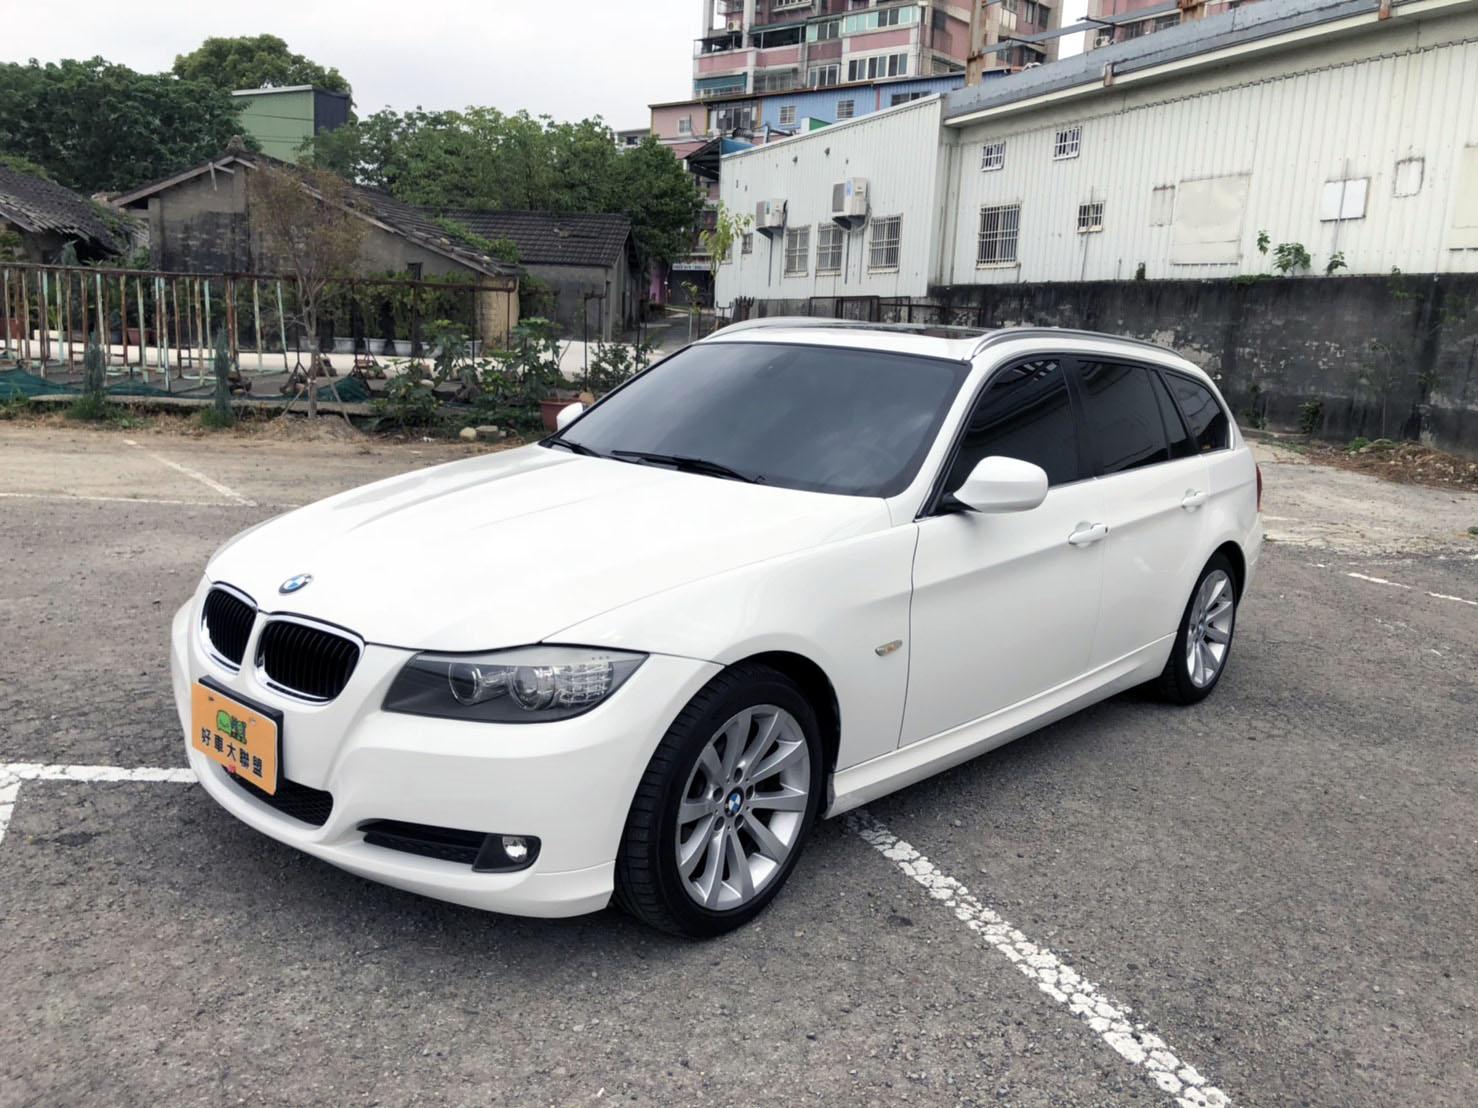 2011 BMW 寶馬 3 series touring